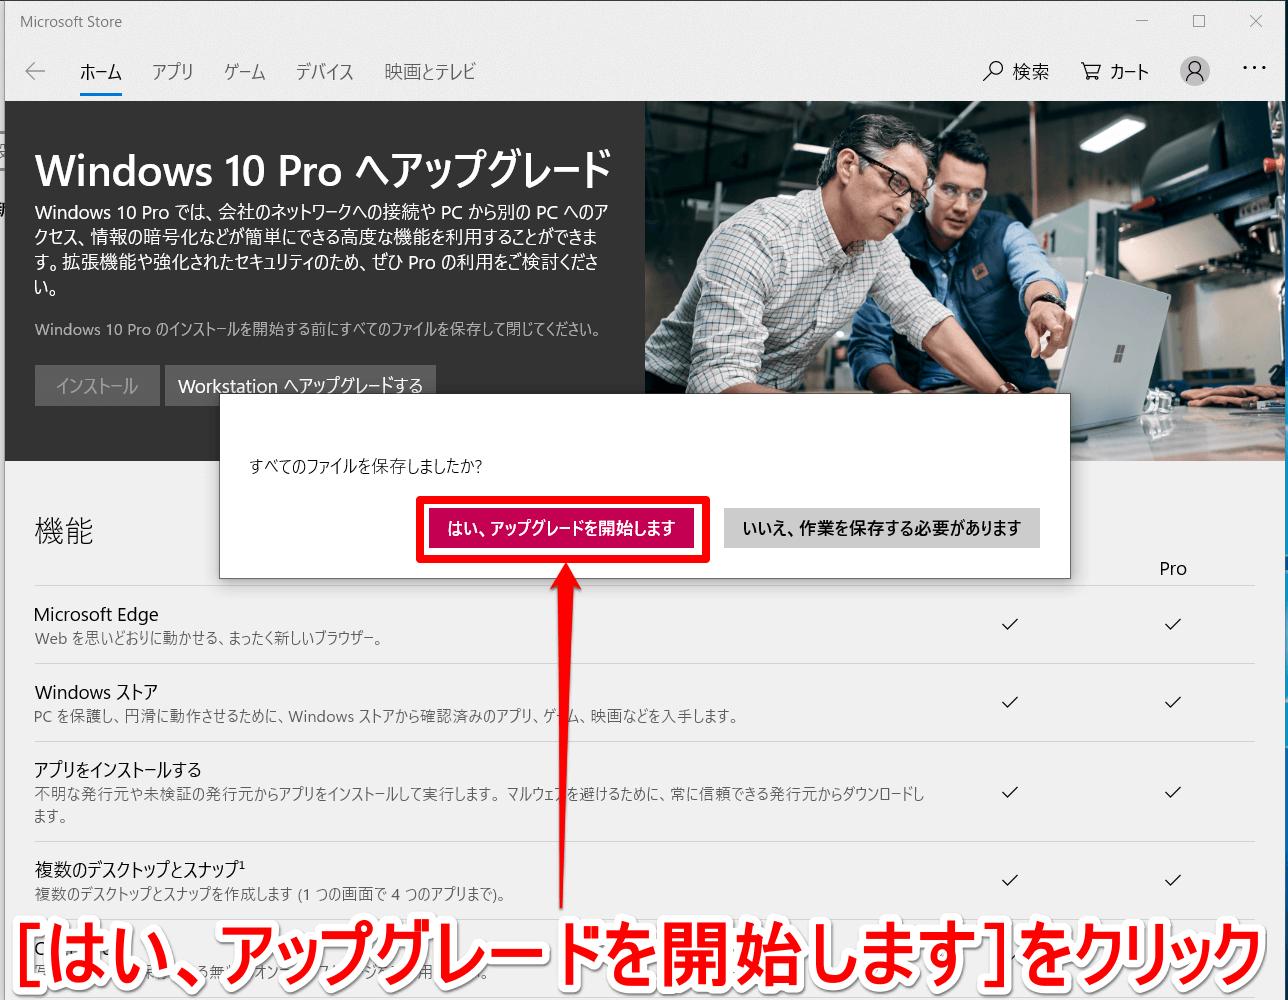 「Windows 10 Proへアップグレード」画面(アップグレード確認画面)